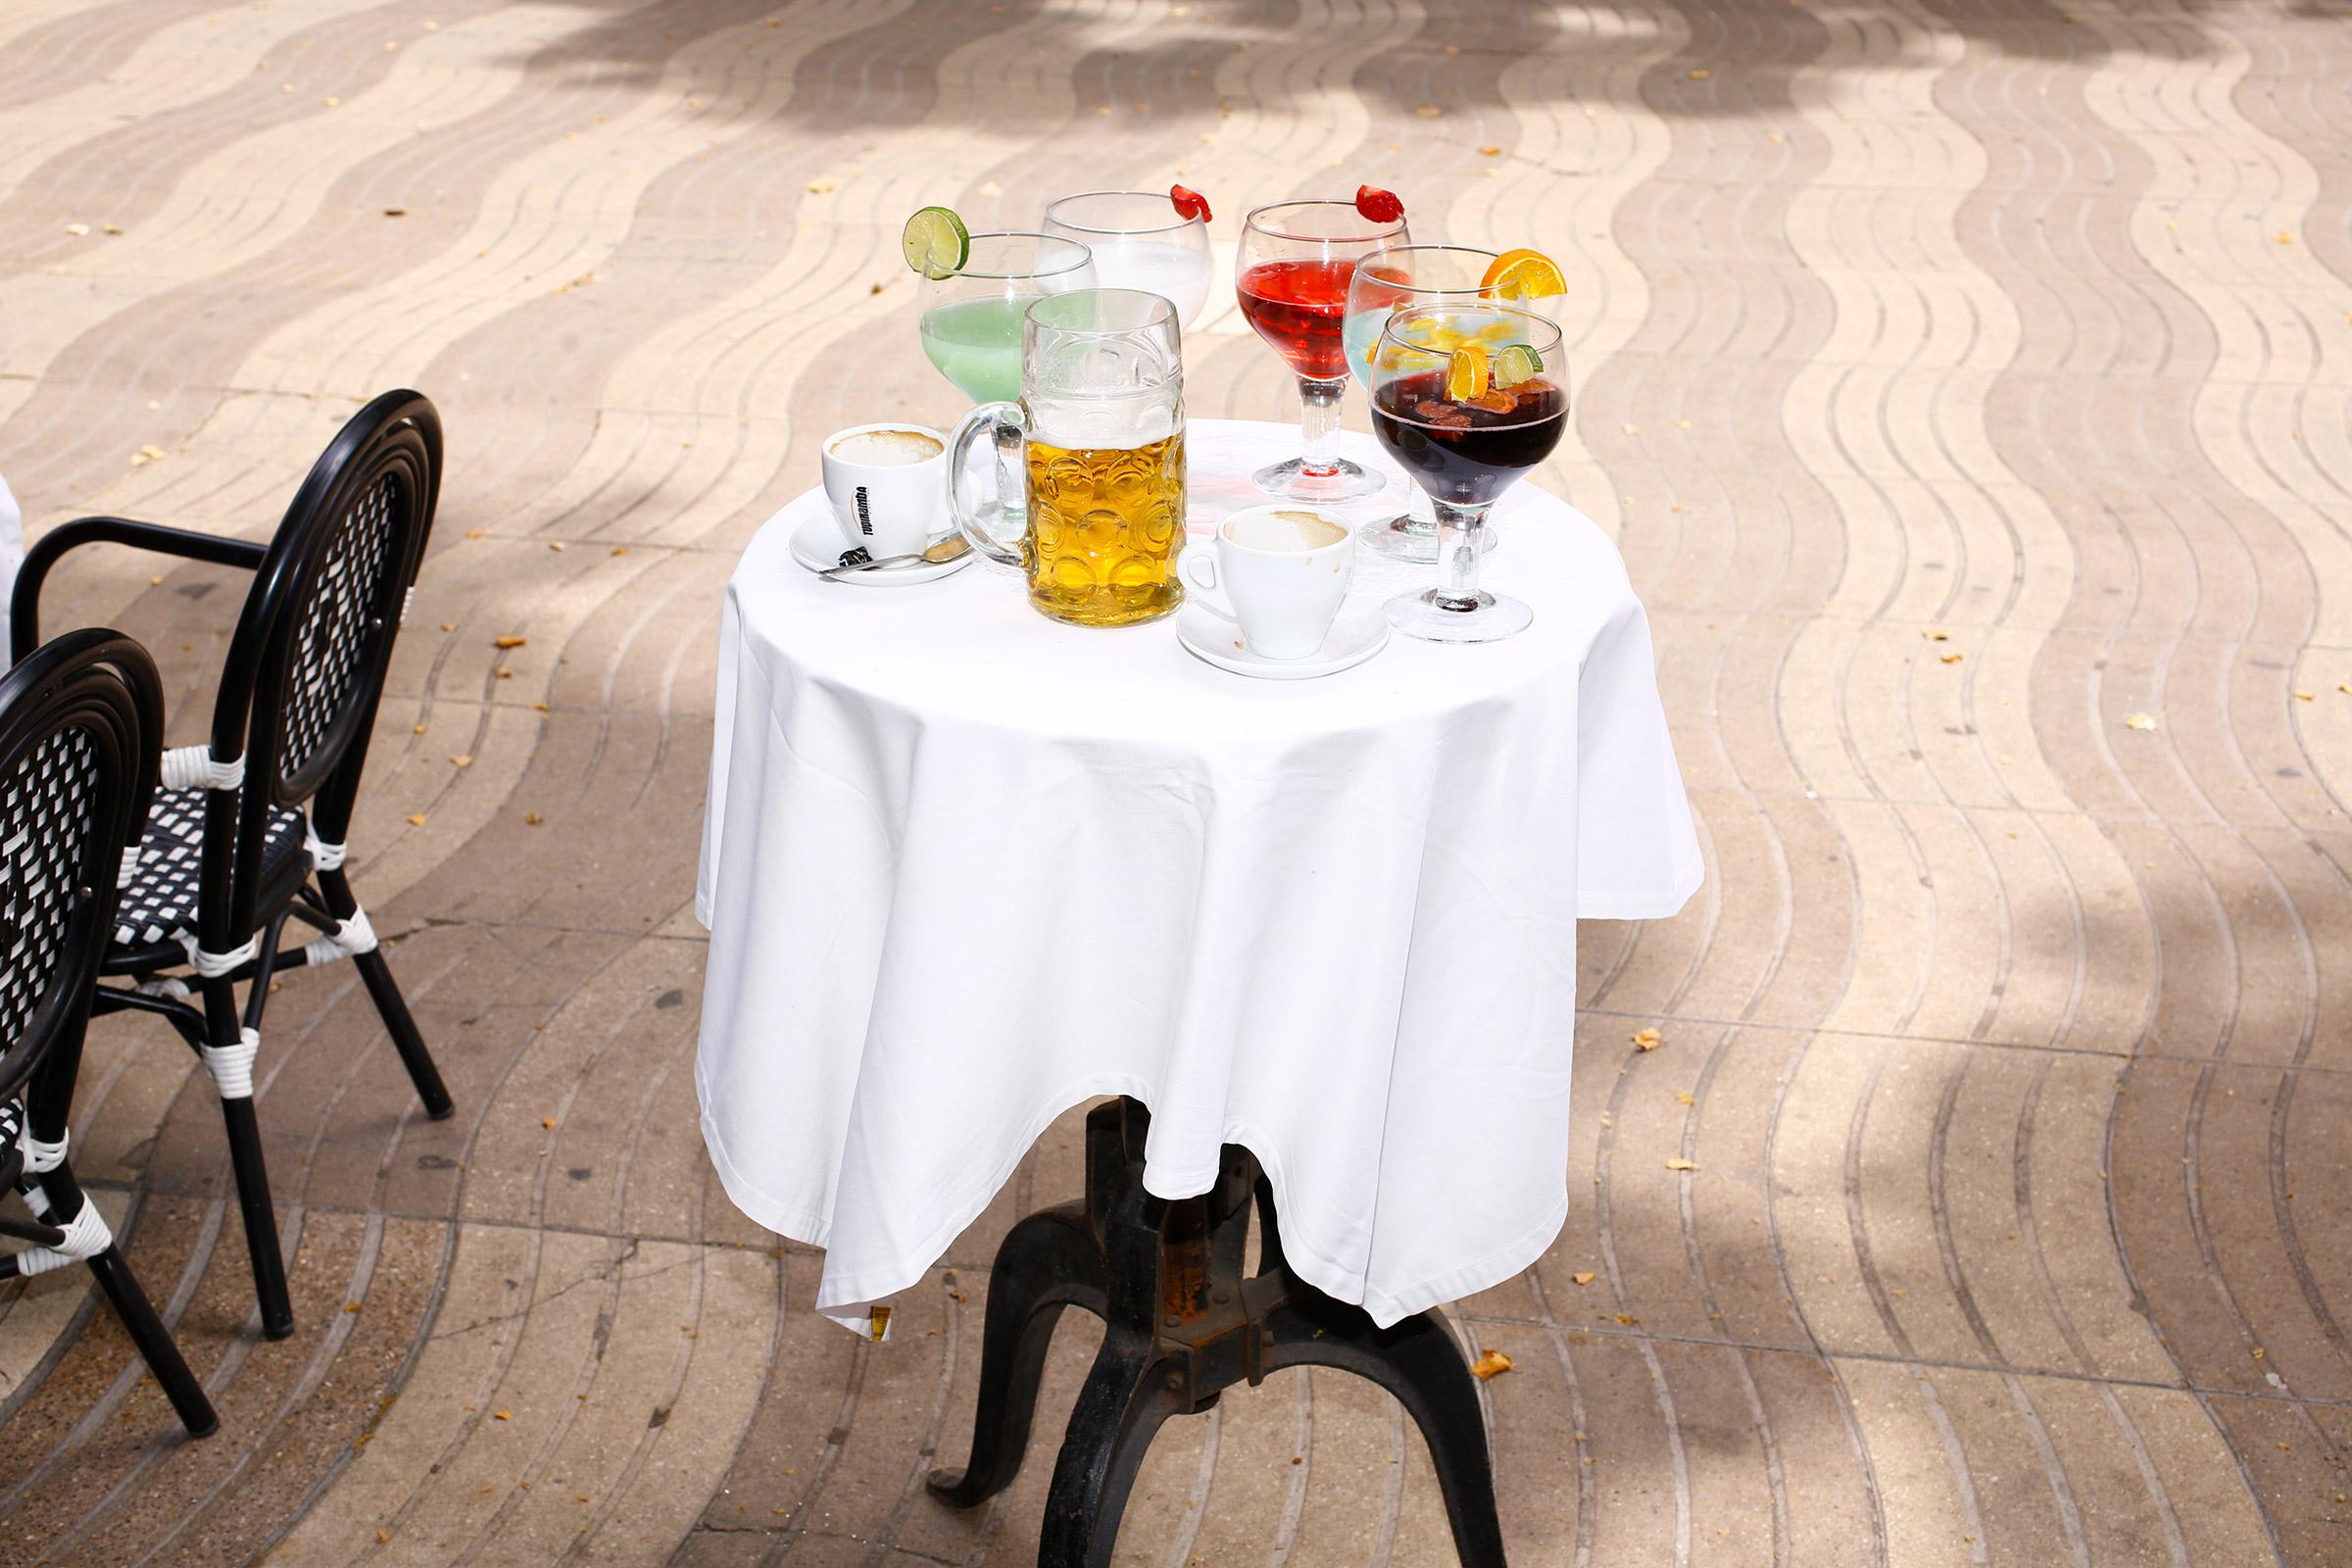 A cafe on Las Ramblas in Barcelona on June 6.